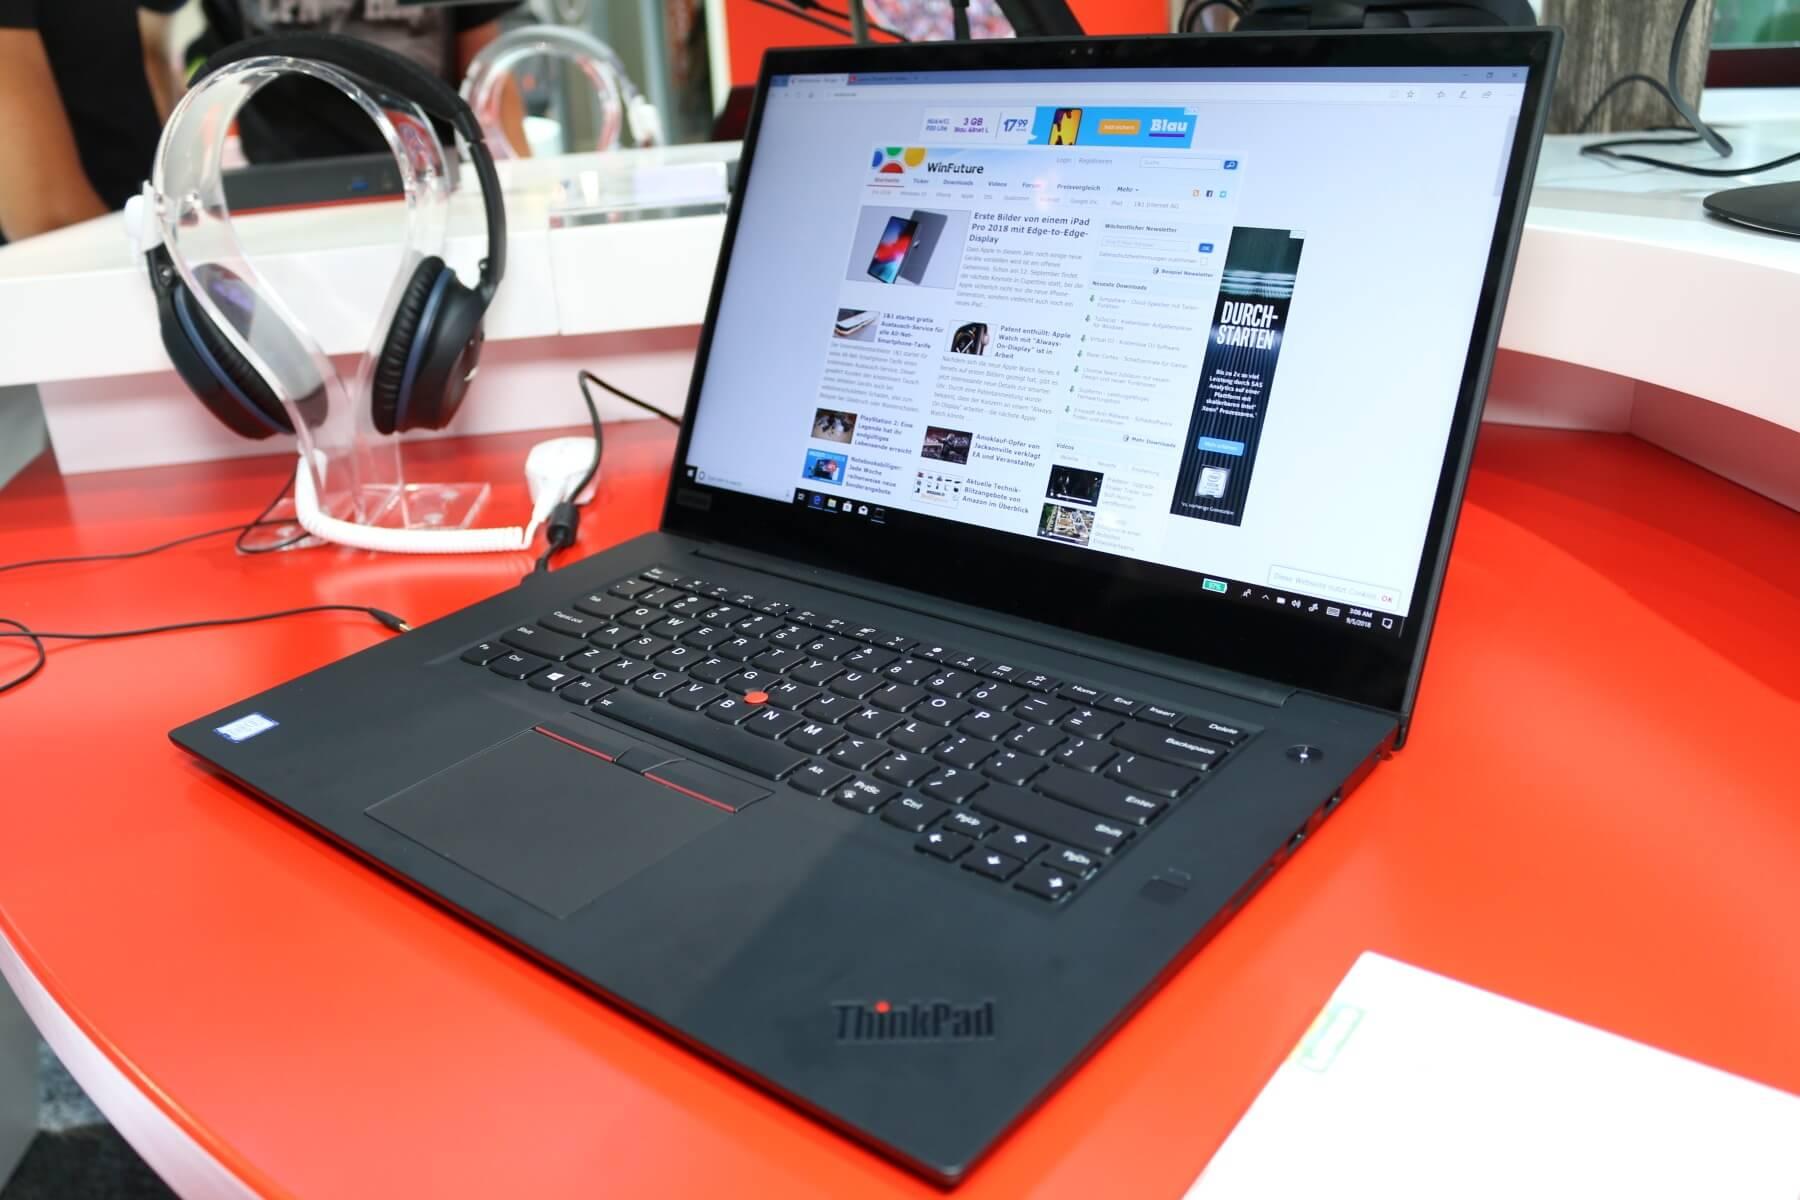 ThinkPad X1 Extreme: Lenovos MacBook Pro-Konkurrent im Hands-On